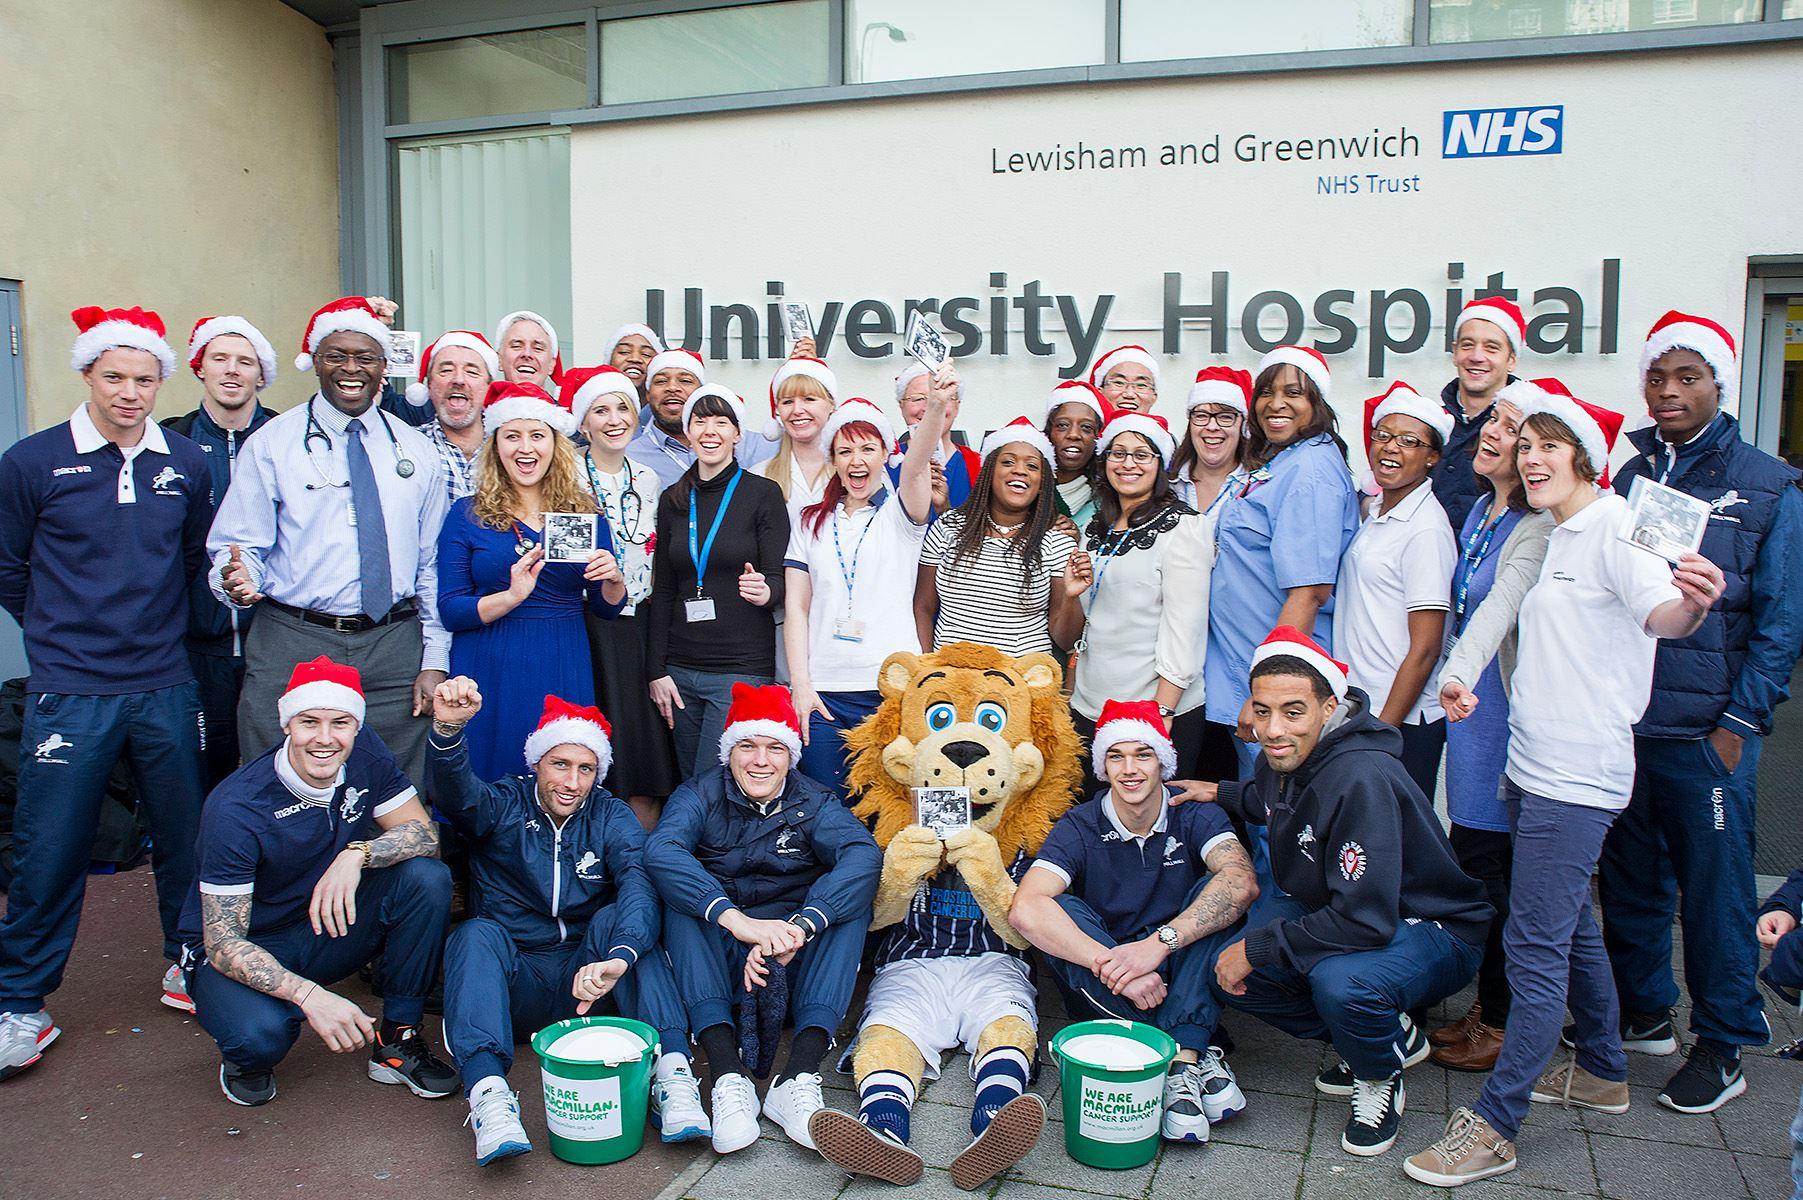 LEWISHAM AND GREENWICH NHS CHOIR FRONT-RUNNER IN CHRISTMAS NO 1 RACE Credit: Facebook/Lewisham NHS Choir